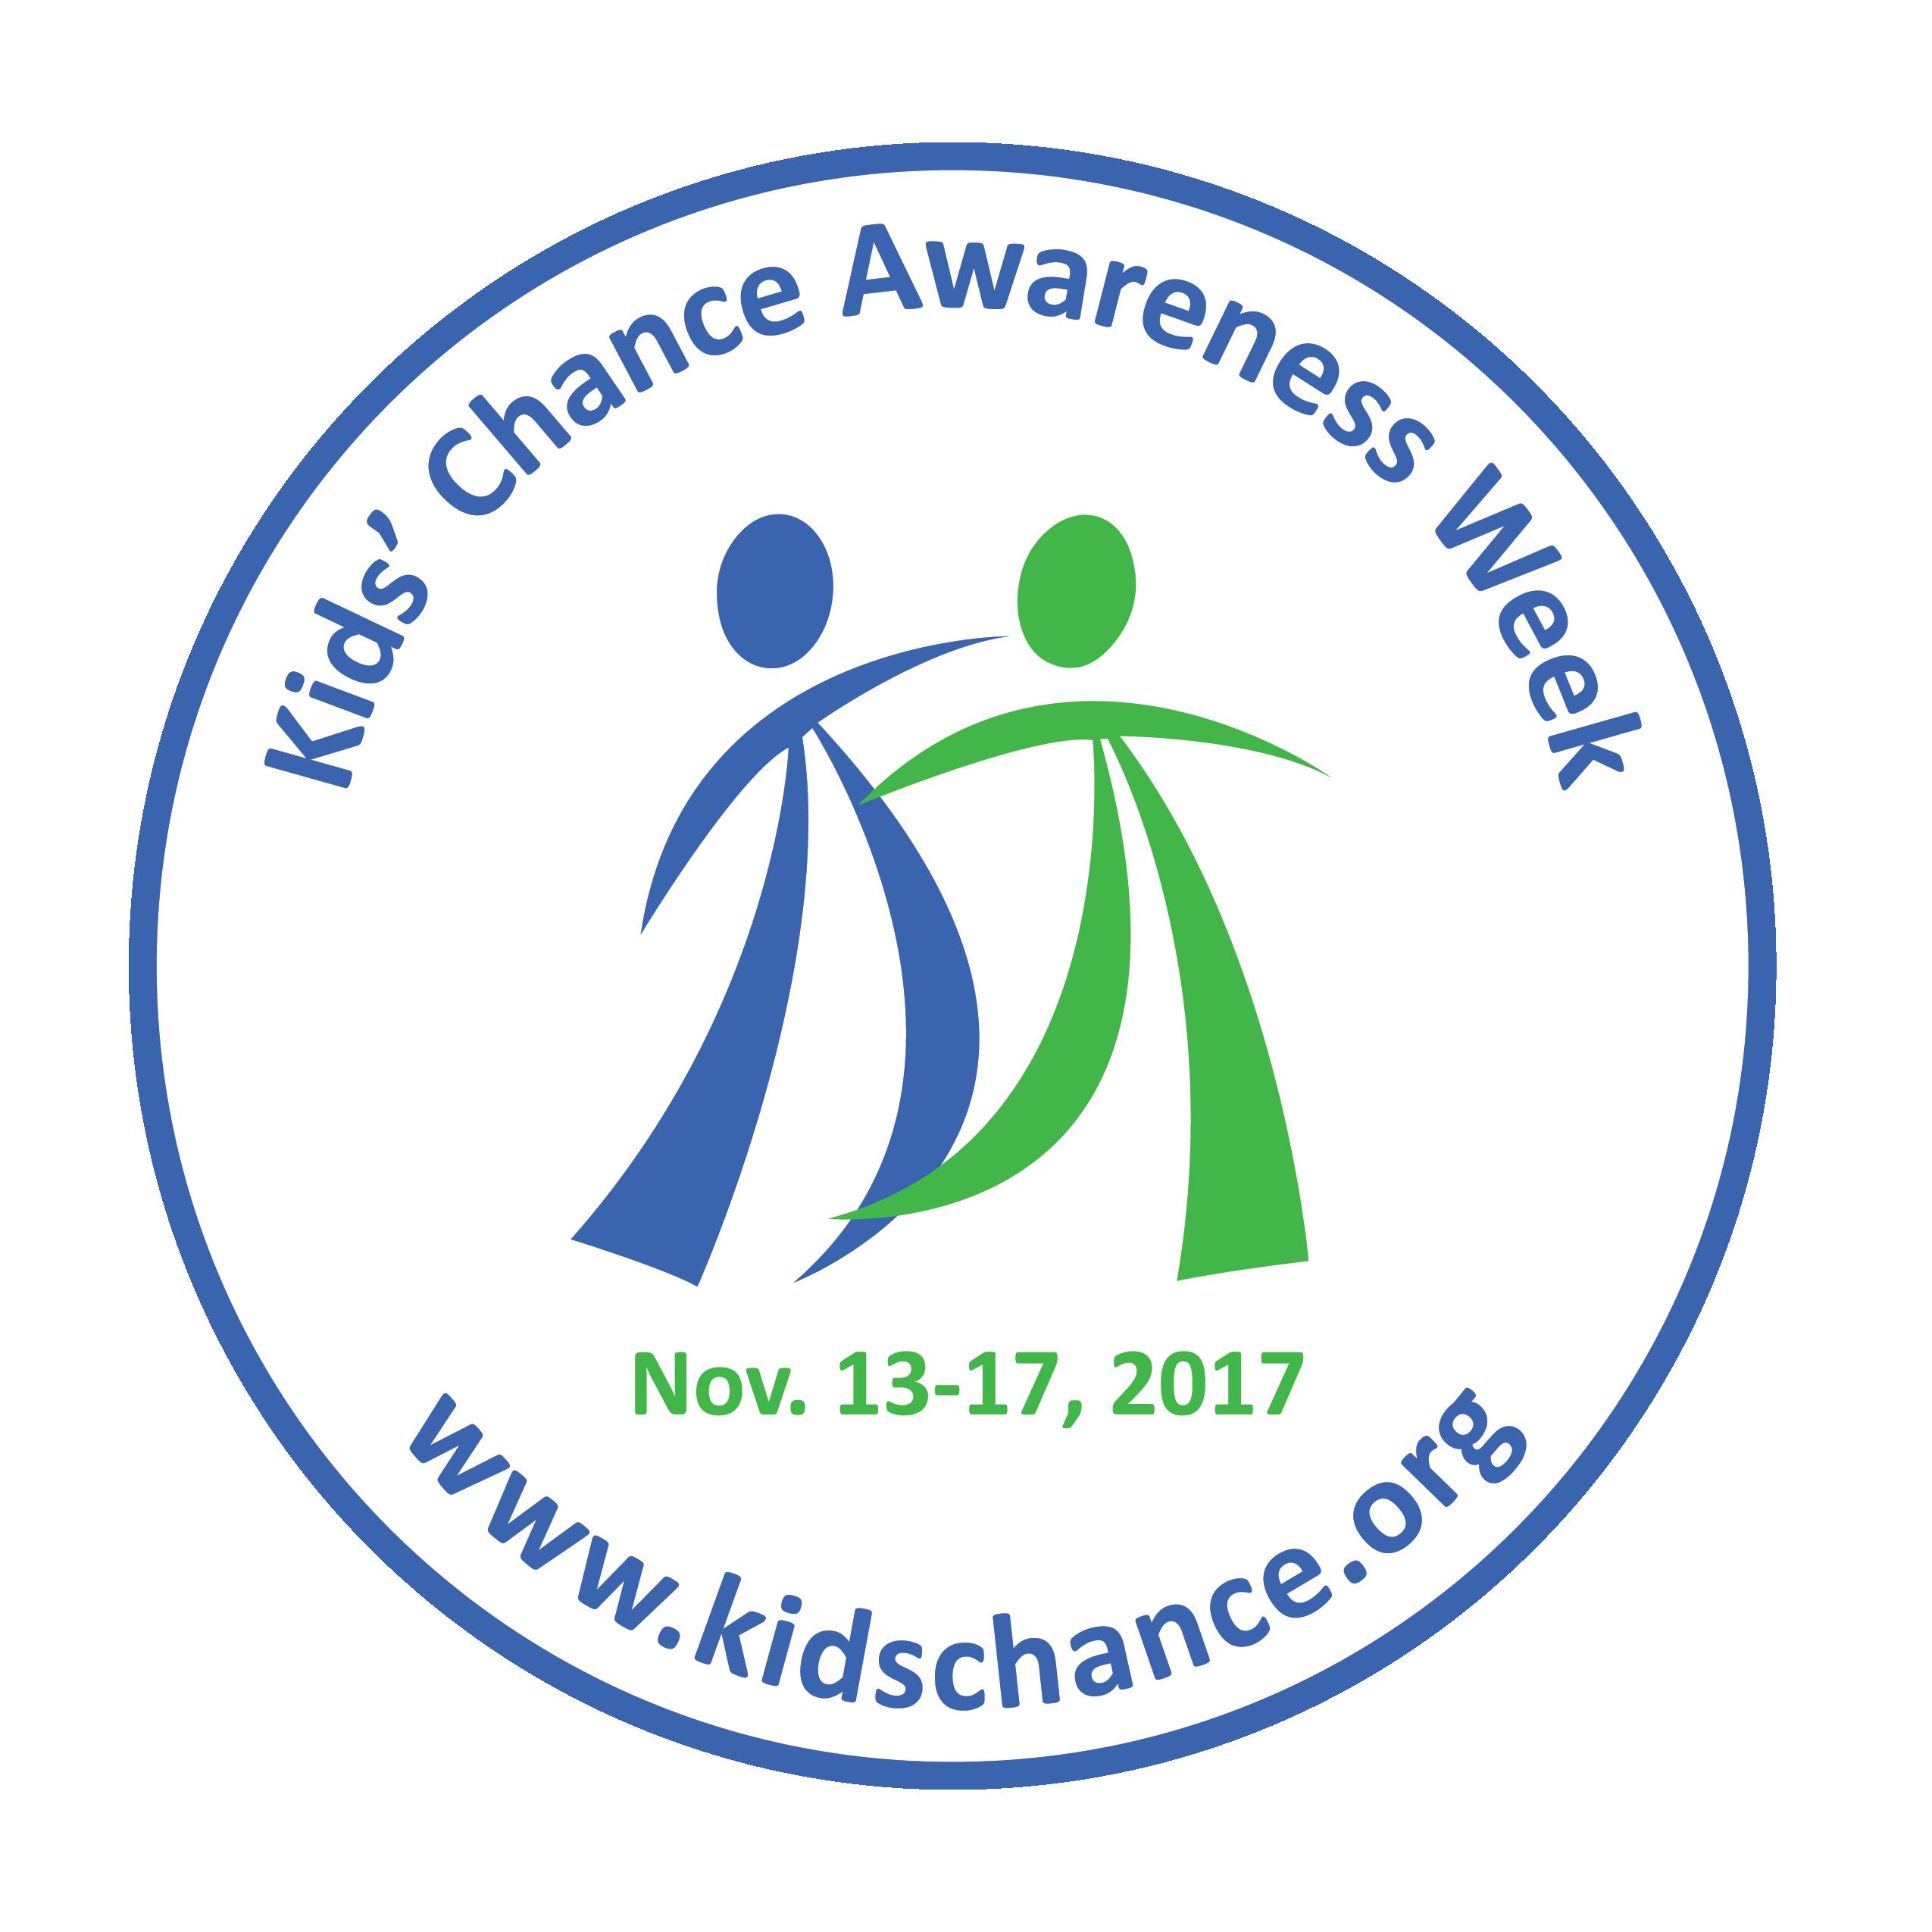 Kids' Chance Awareness Week Graphic